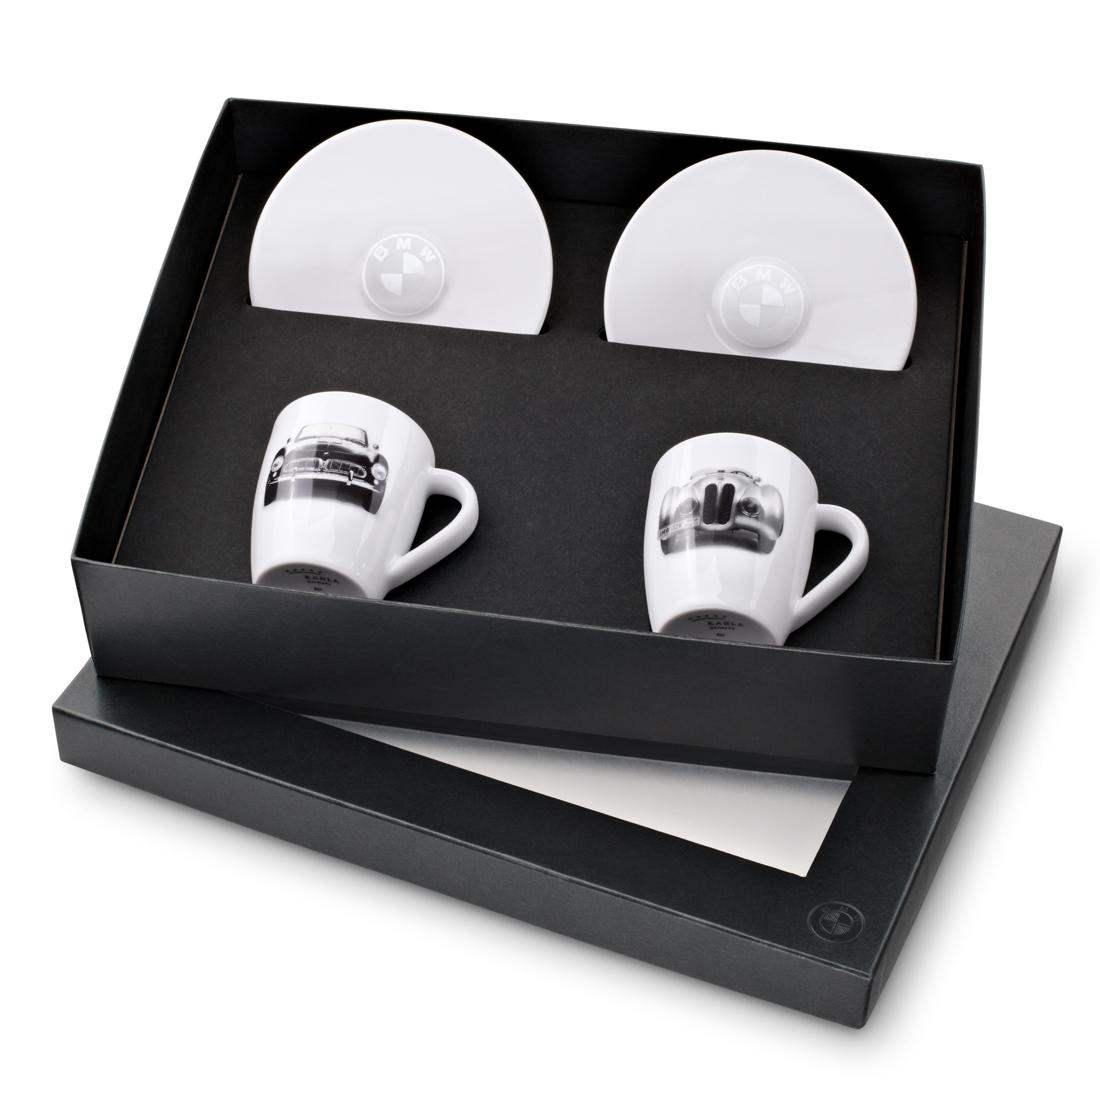 bmw classic espresso cup set. Black Bedroom Furniture Sets. Home Design Ideas